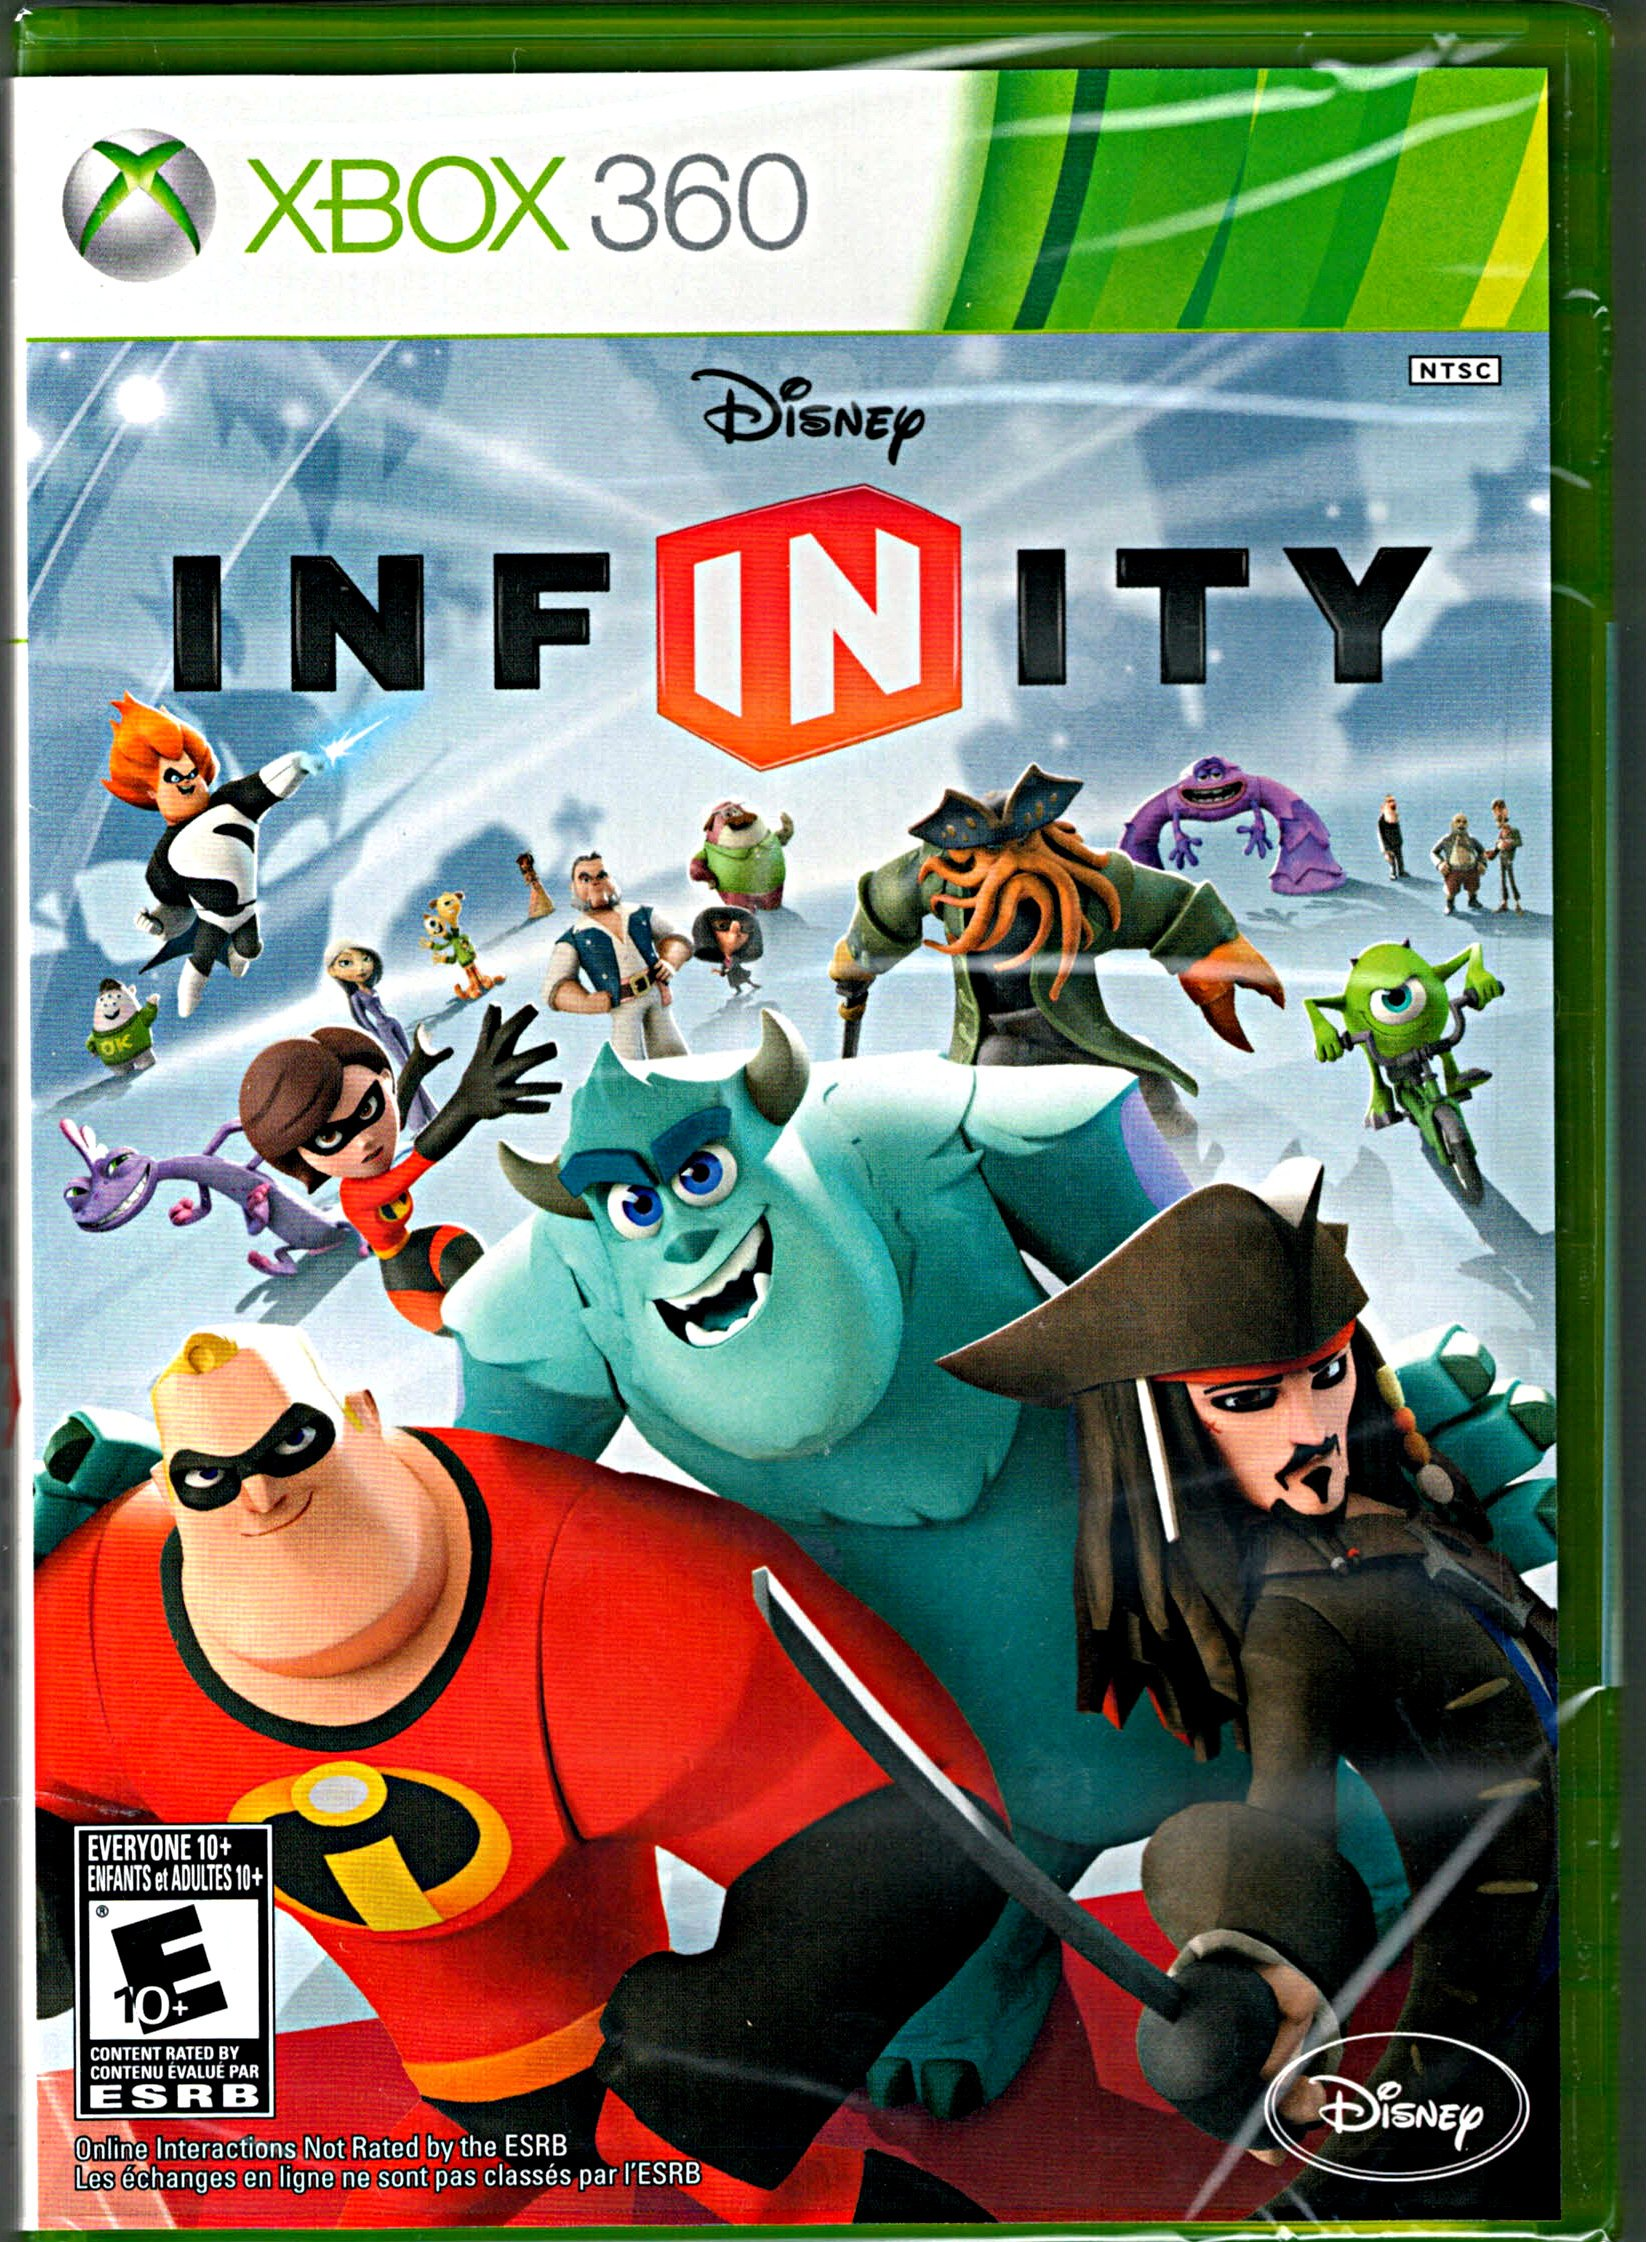 infinity 360. image unavailable infinity 360 n